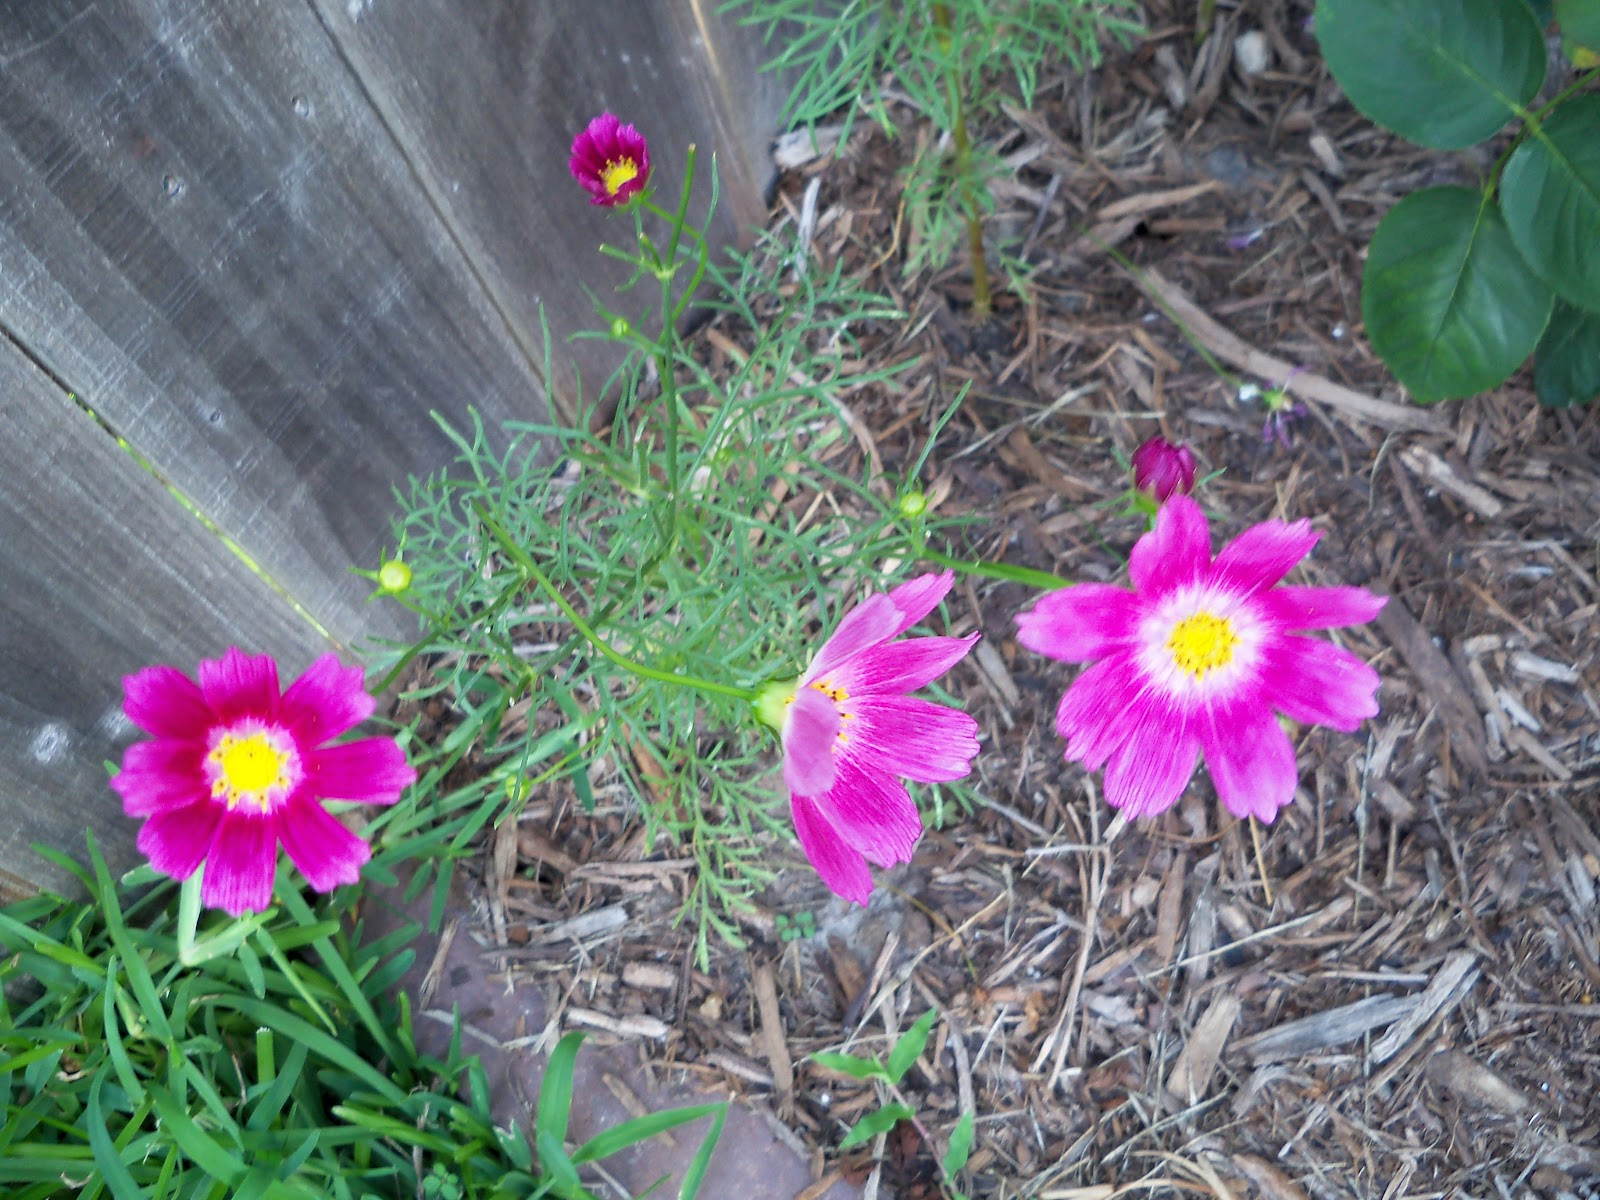 Gardening 2010, Part Two - 101_2491.JPG